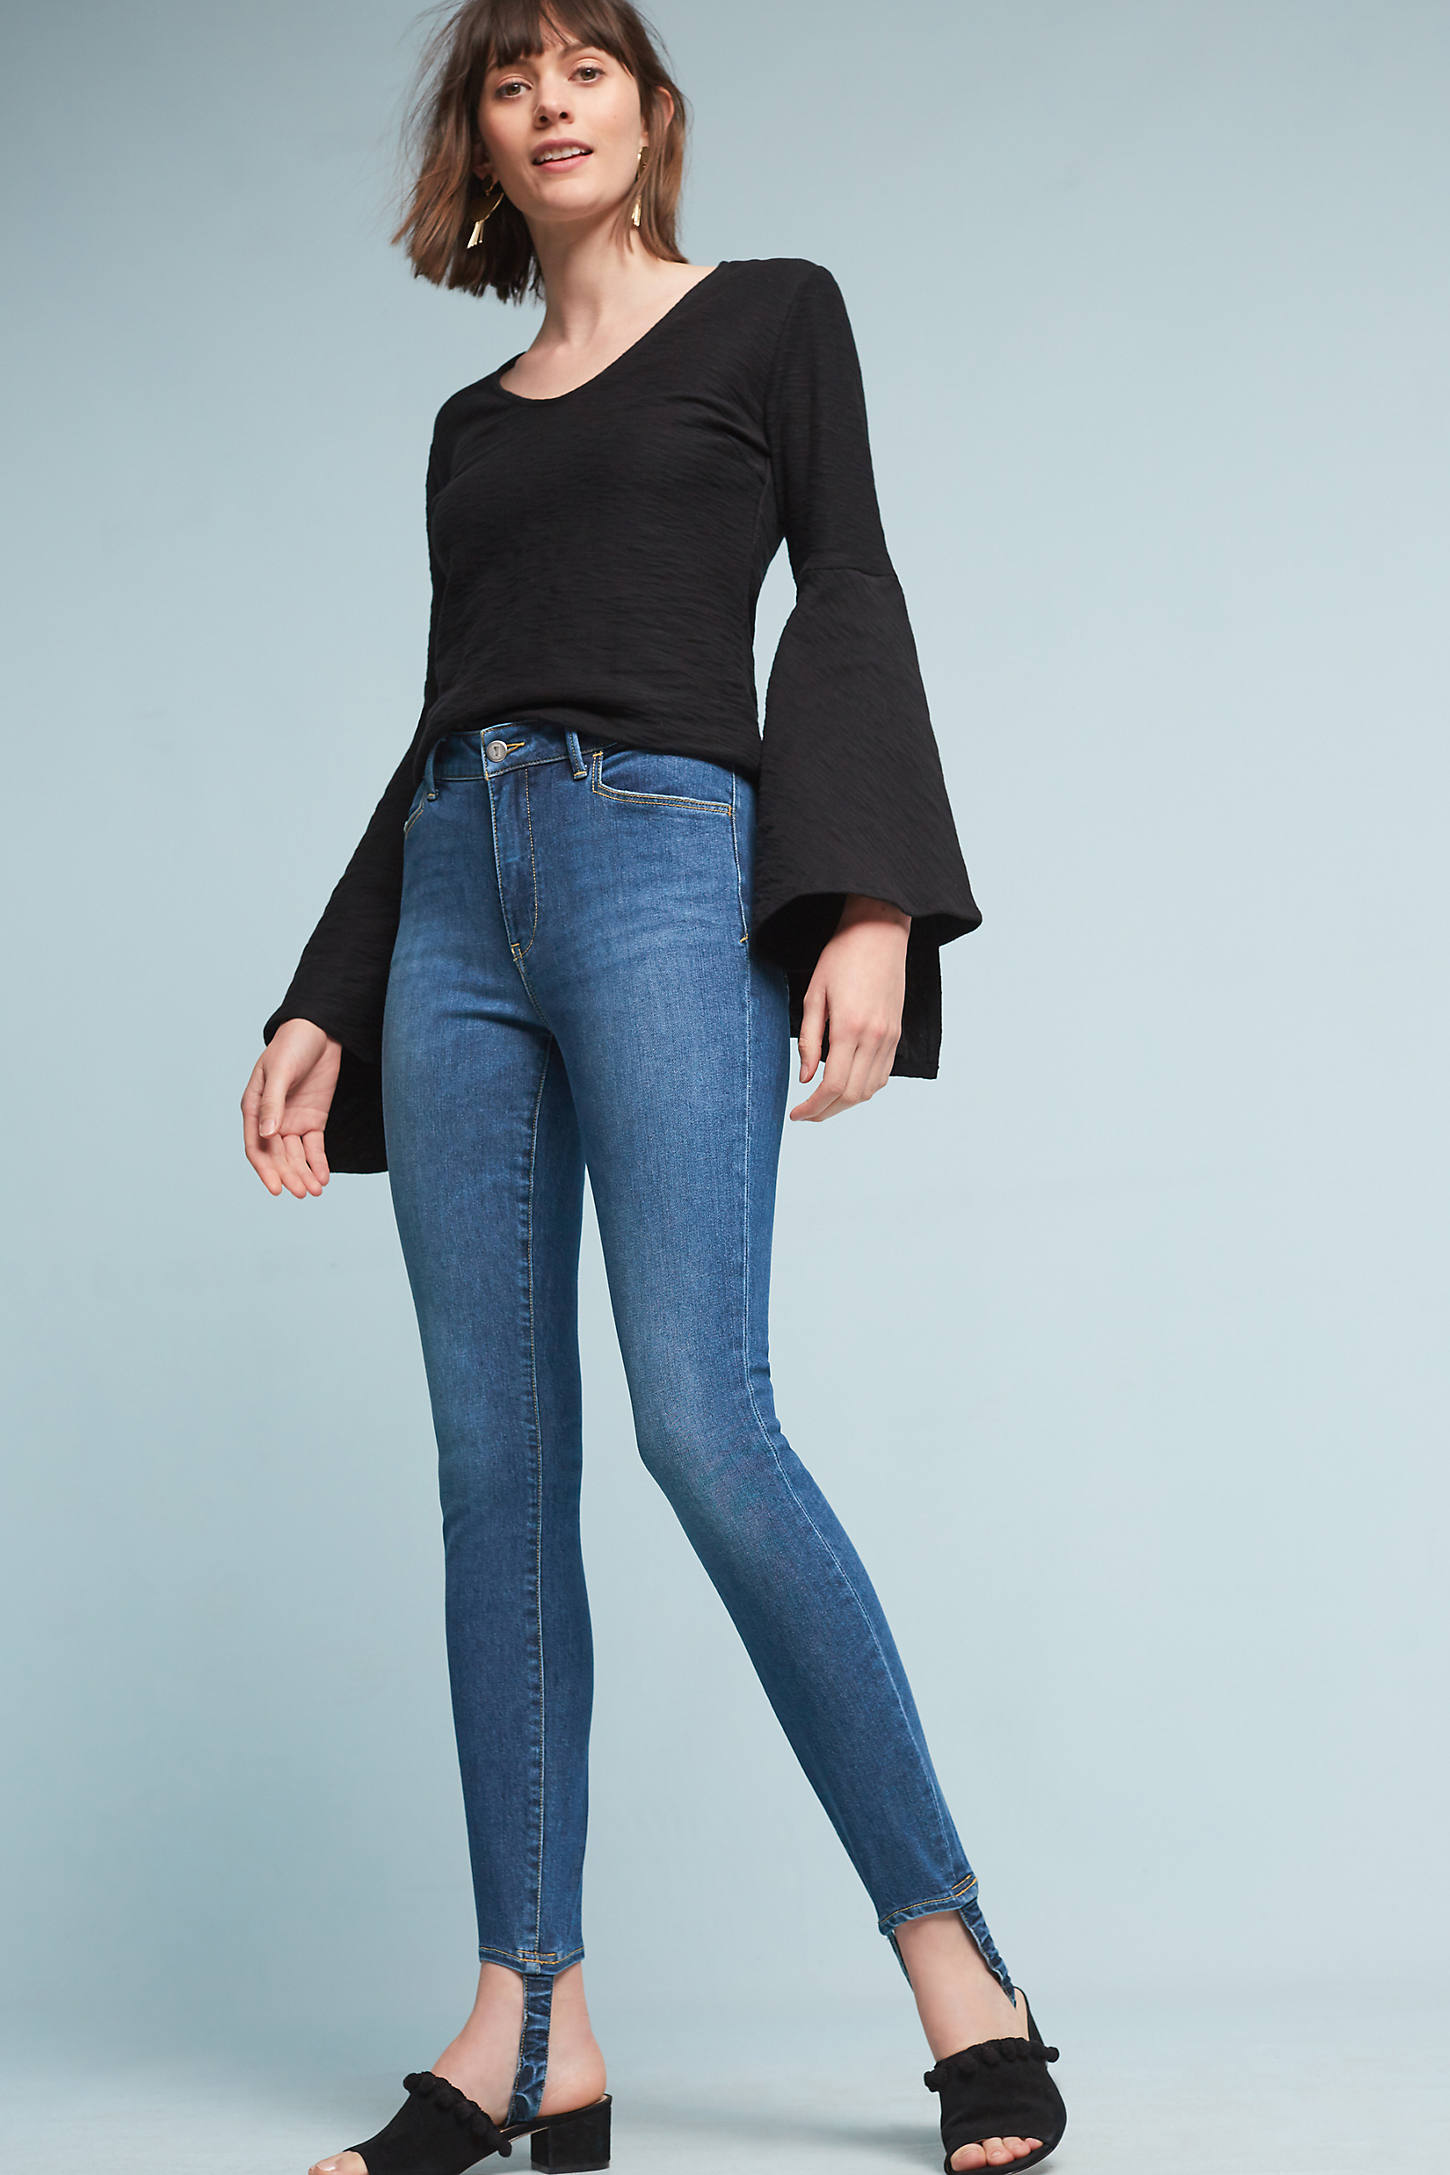 Pilcro Stirrup High-Rise Skinny Jeans